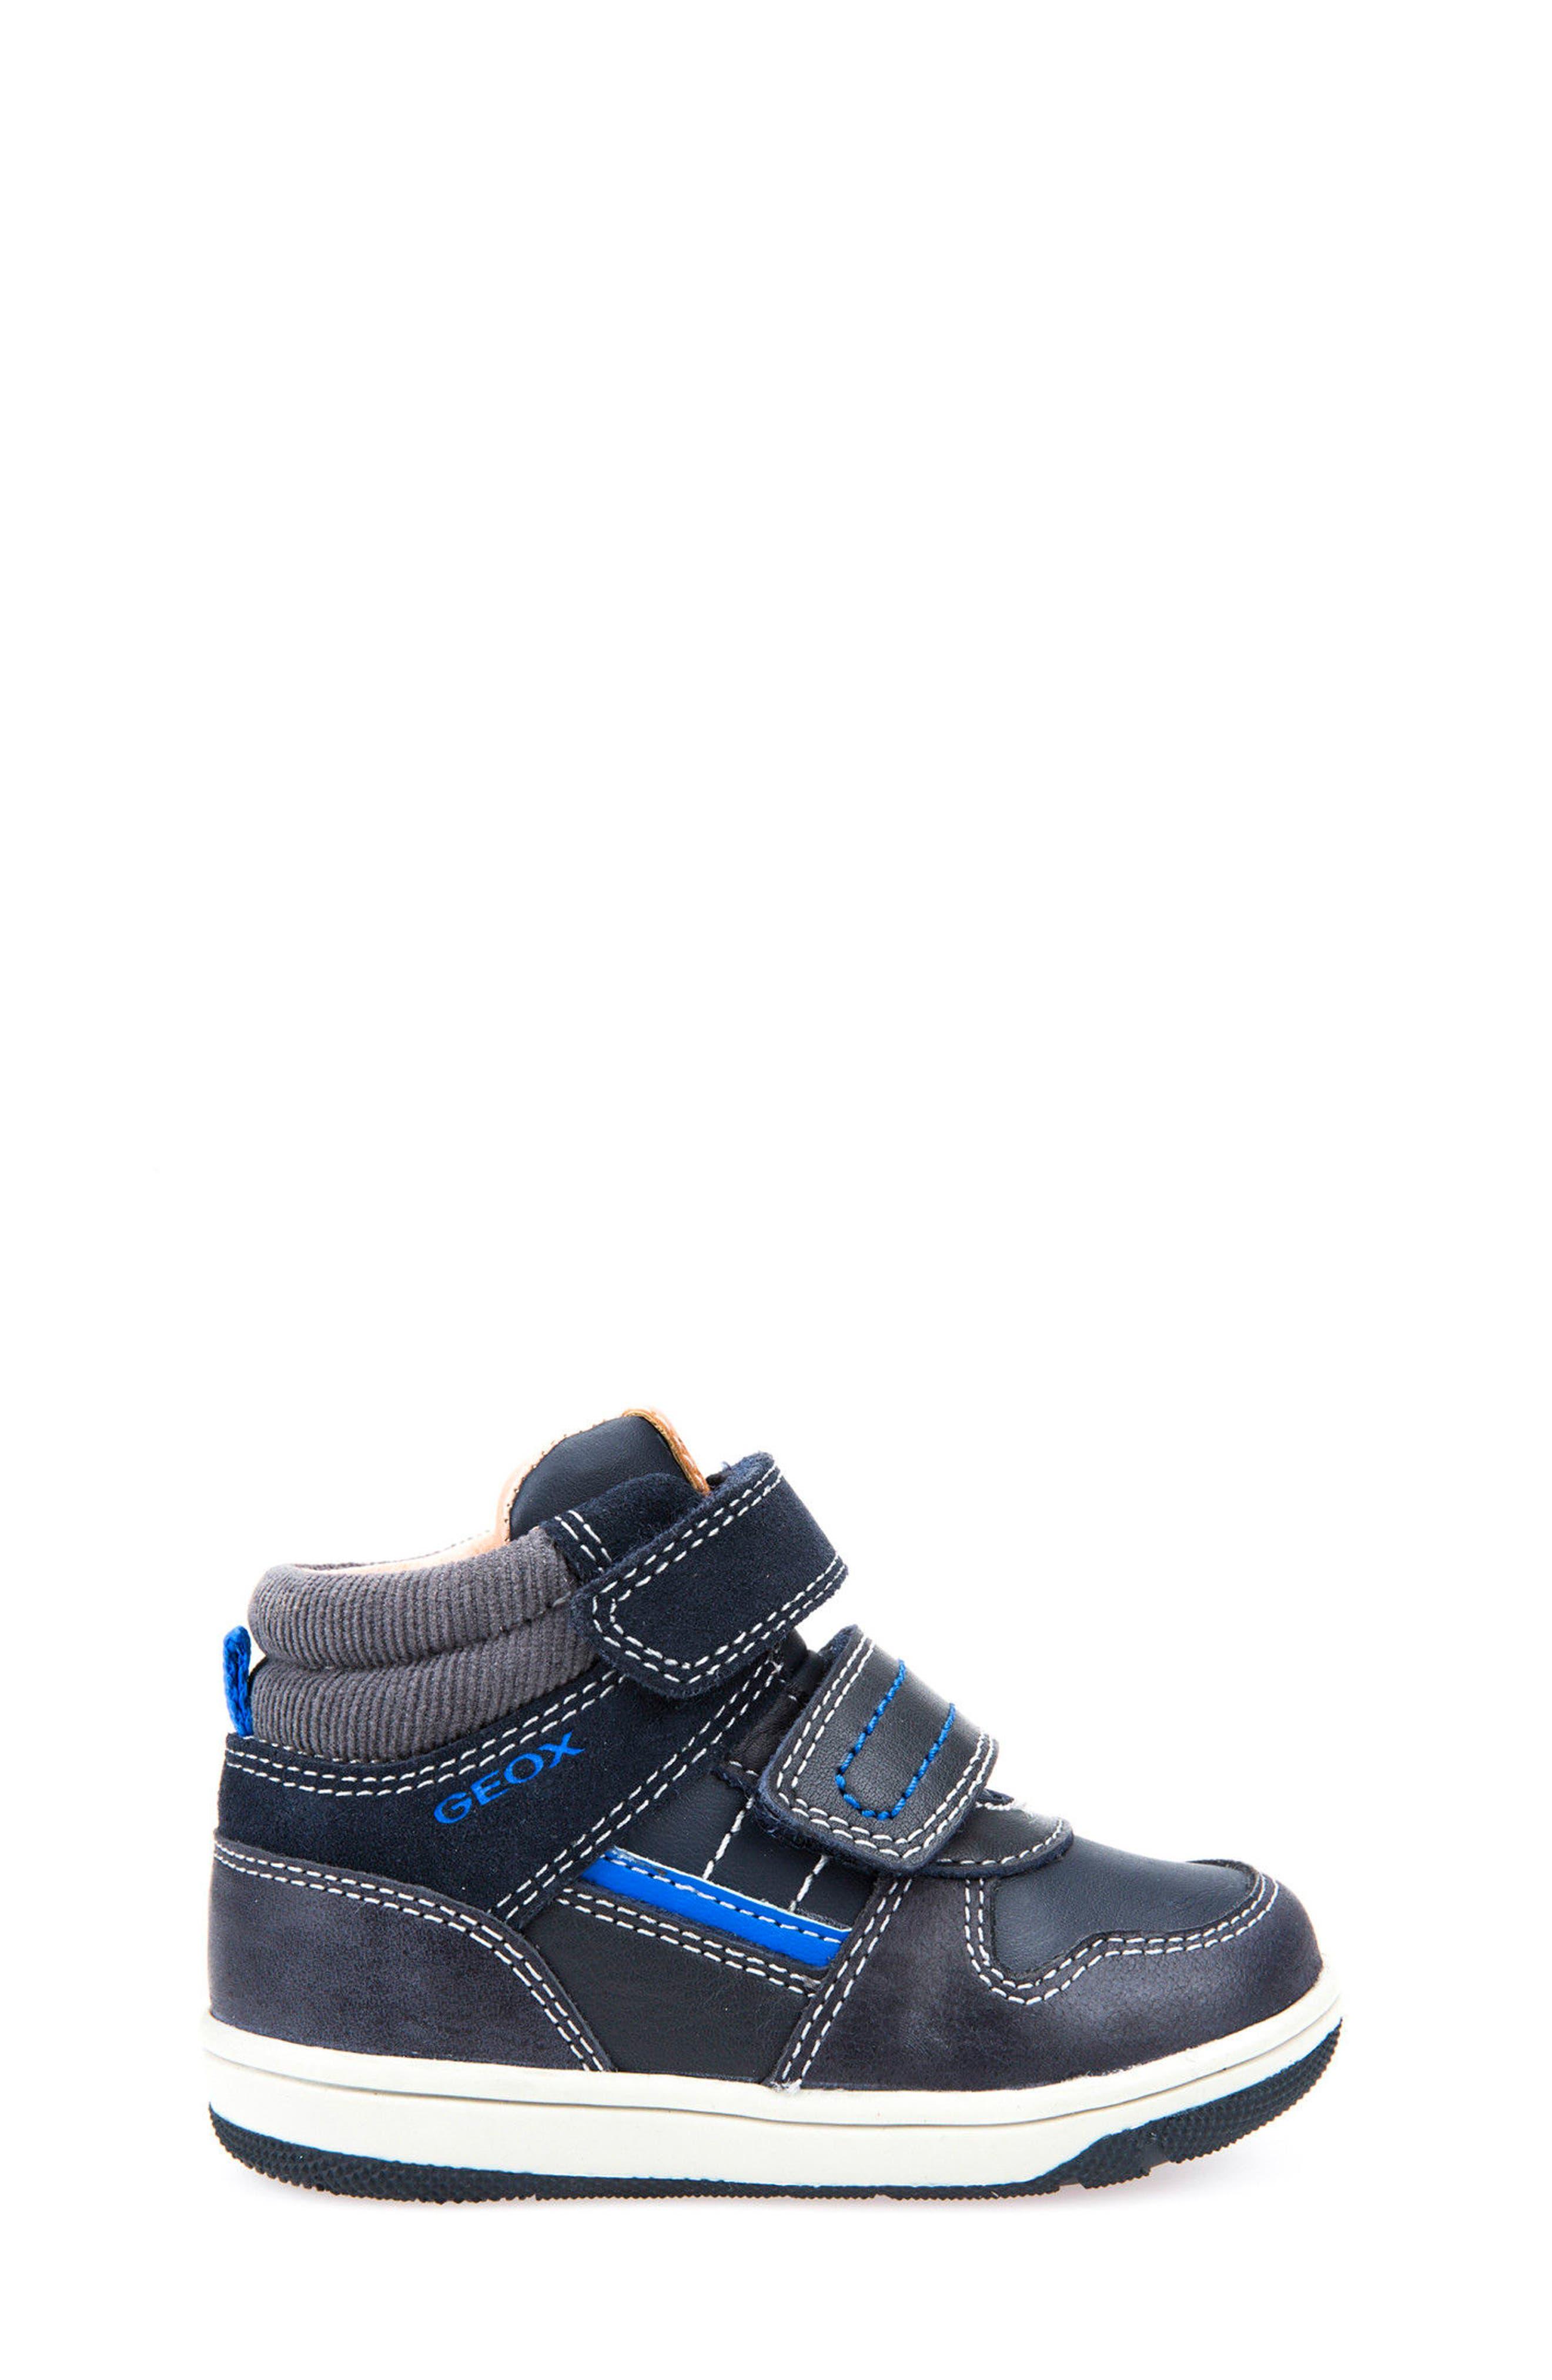 New Flick Mid Top Sneaker,                             Alternate thumbnail 3, color,                             002